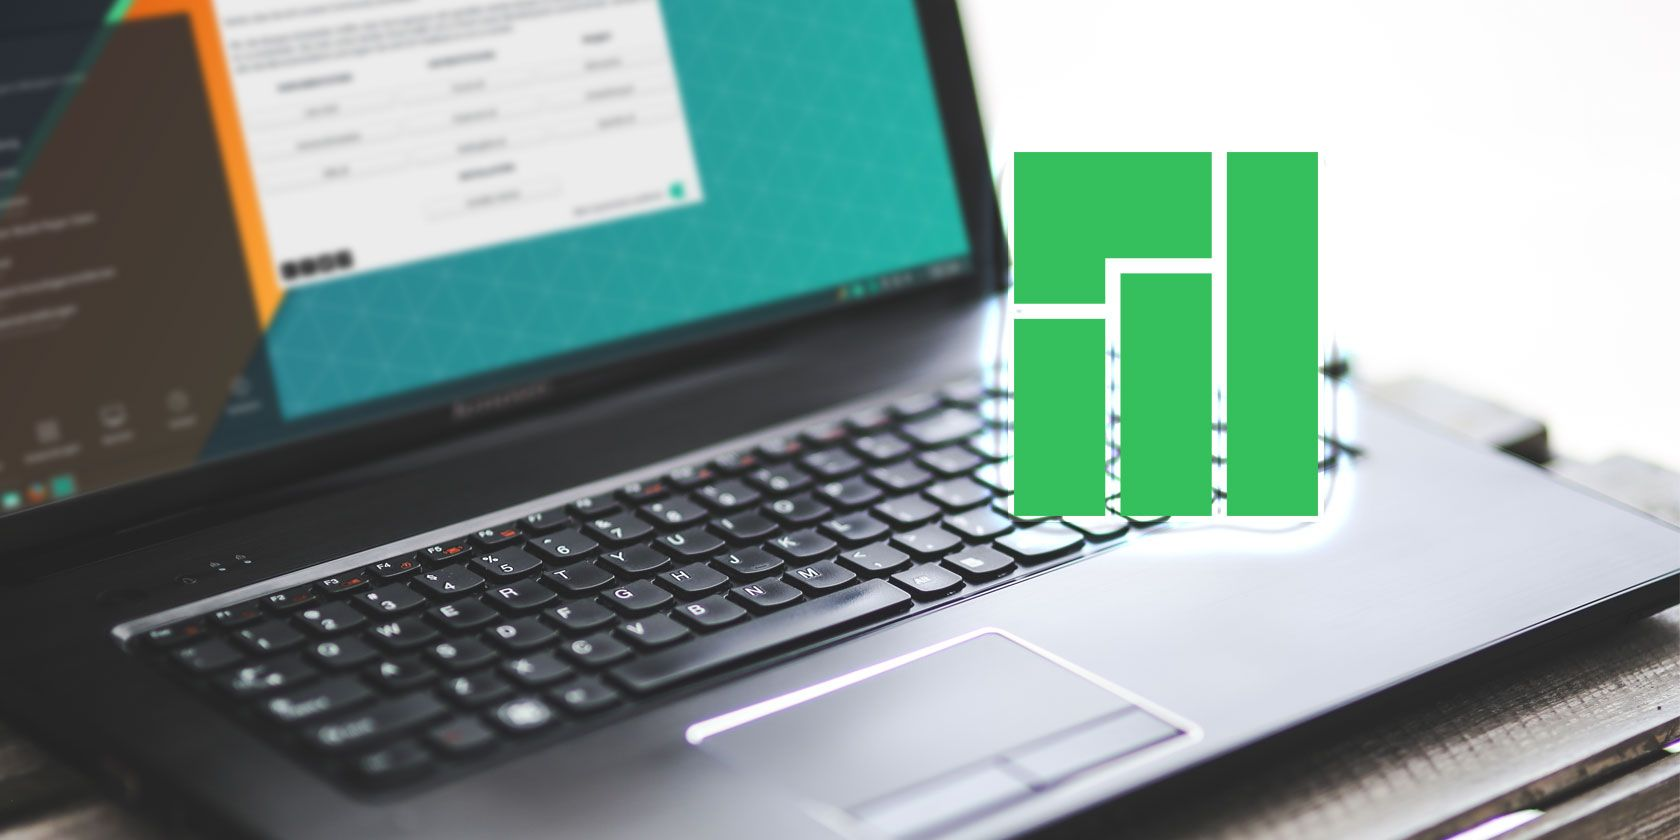 10 Best Linux Distros for Developers